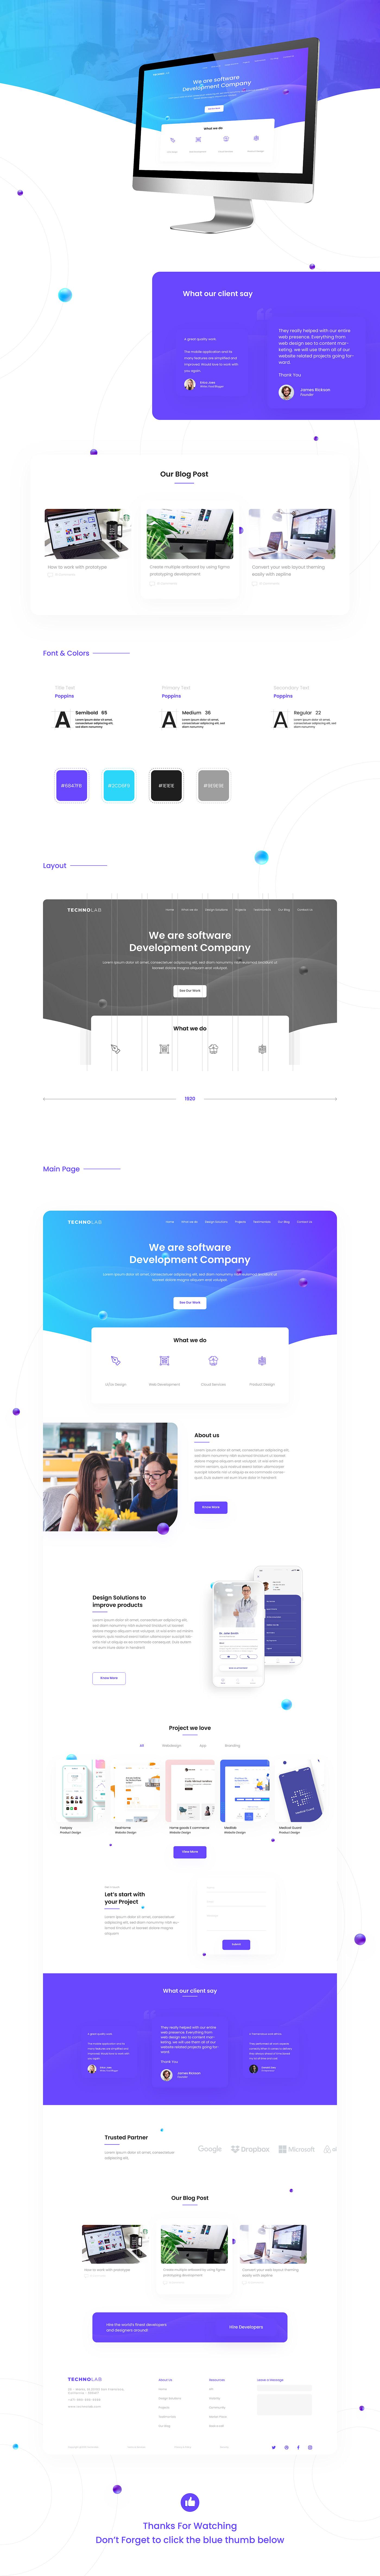 Agency website classy website company website design concept firm IT company It company website IT Firm  landing page Webdesign